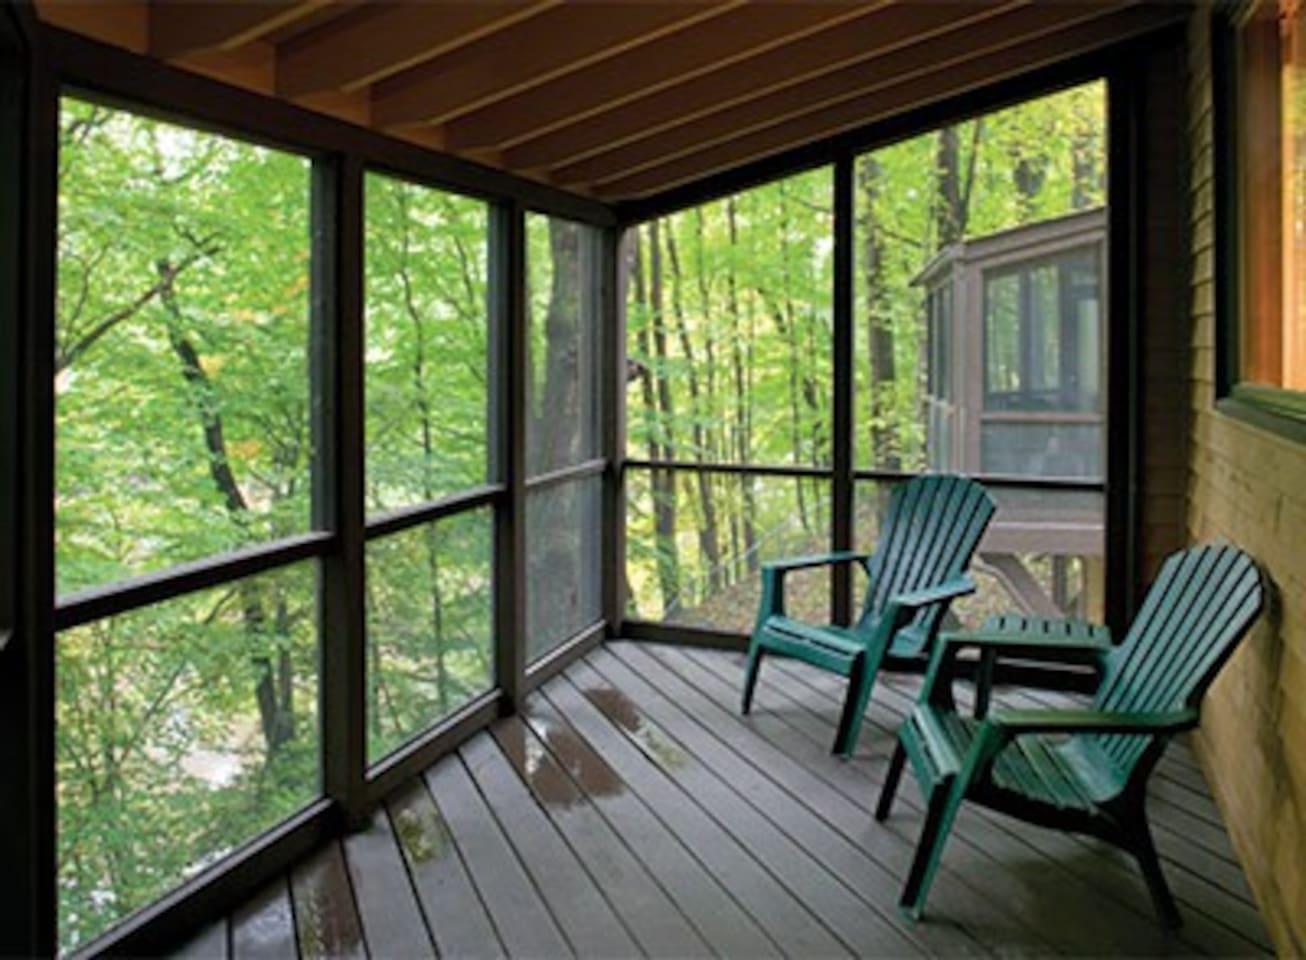 One-Bedroom Condo at Shawnee Village - Free WiFi!